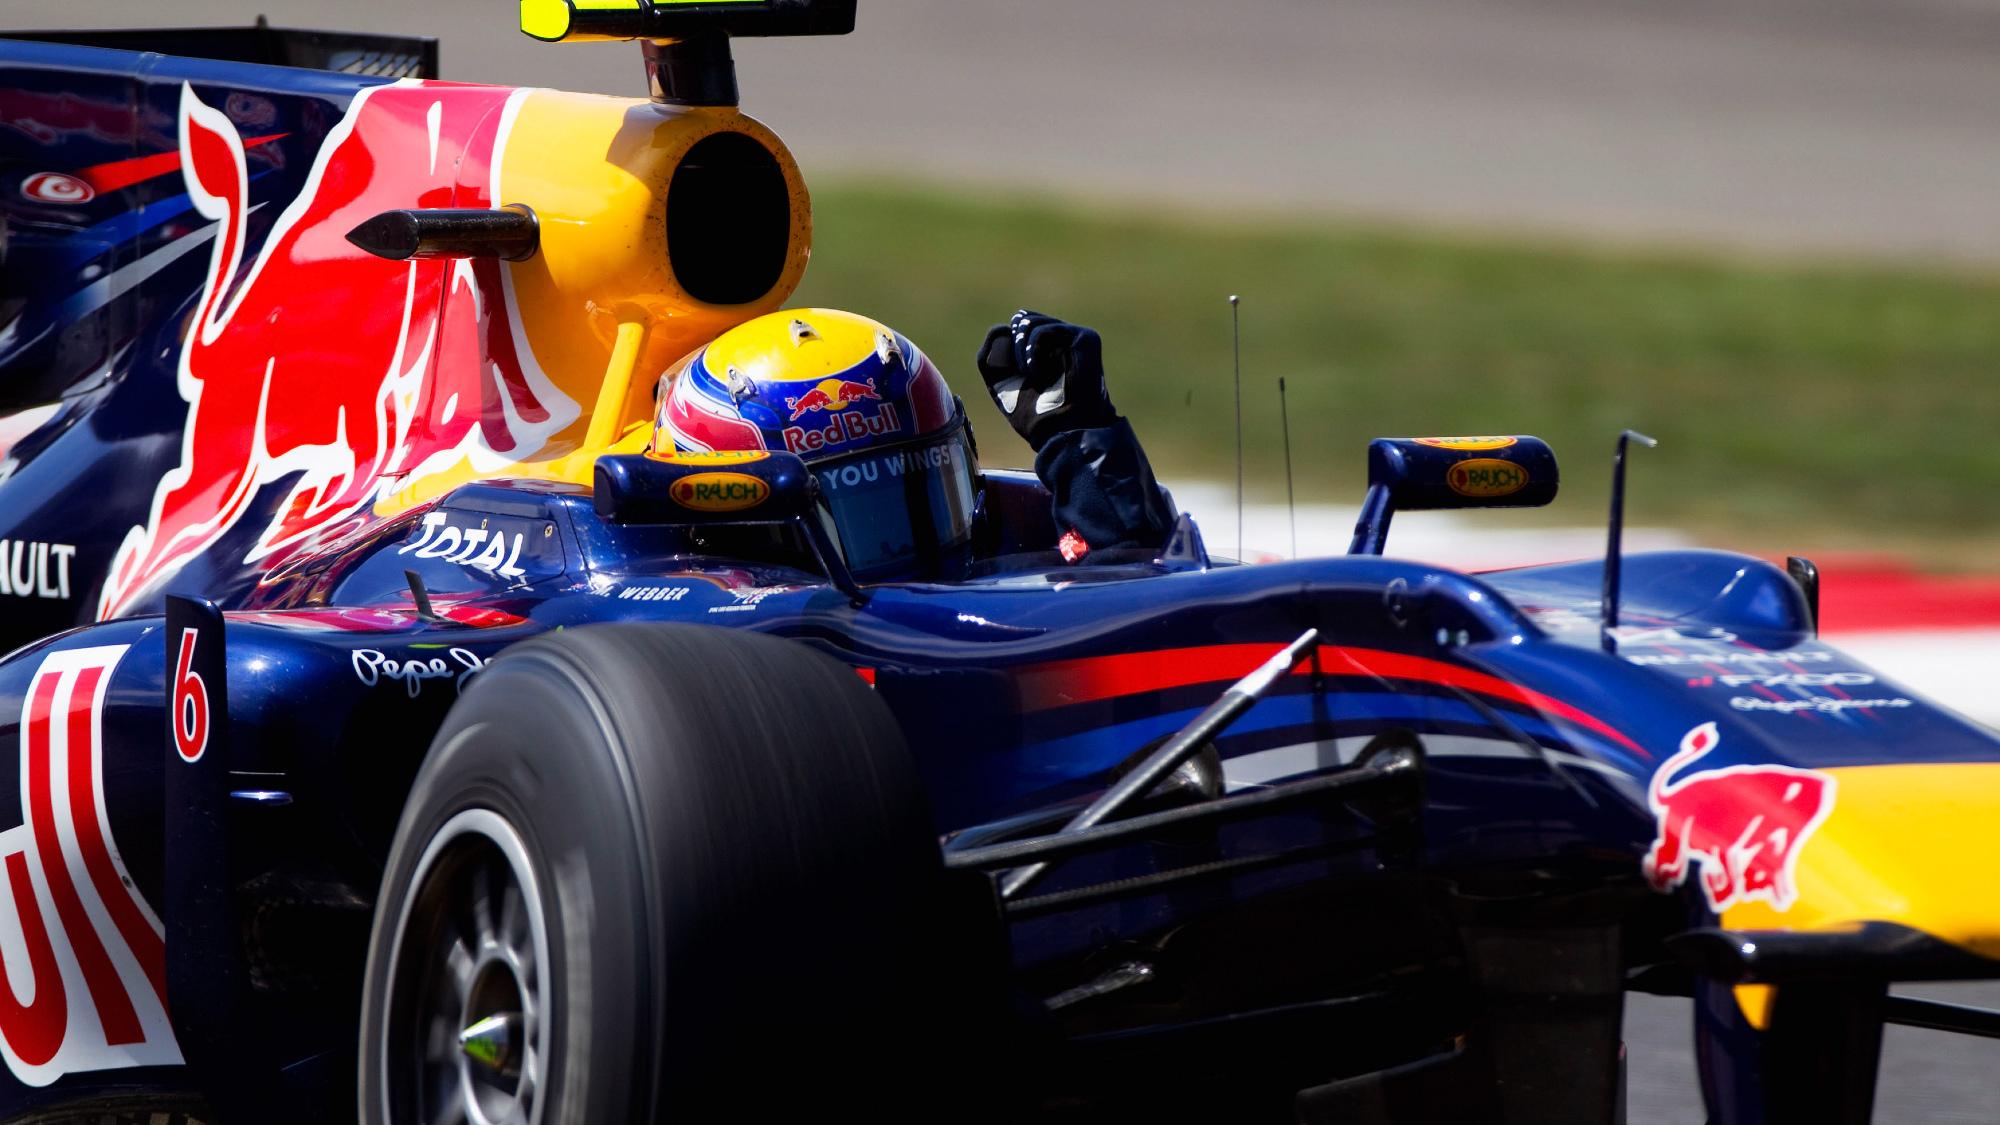 2010 British GP, Mark Webber